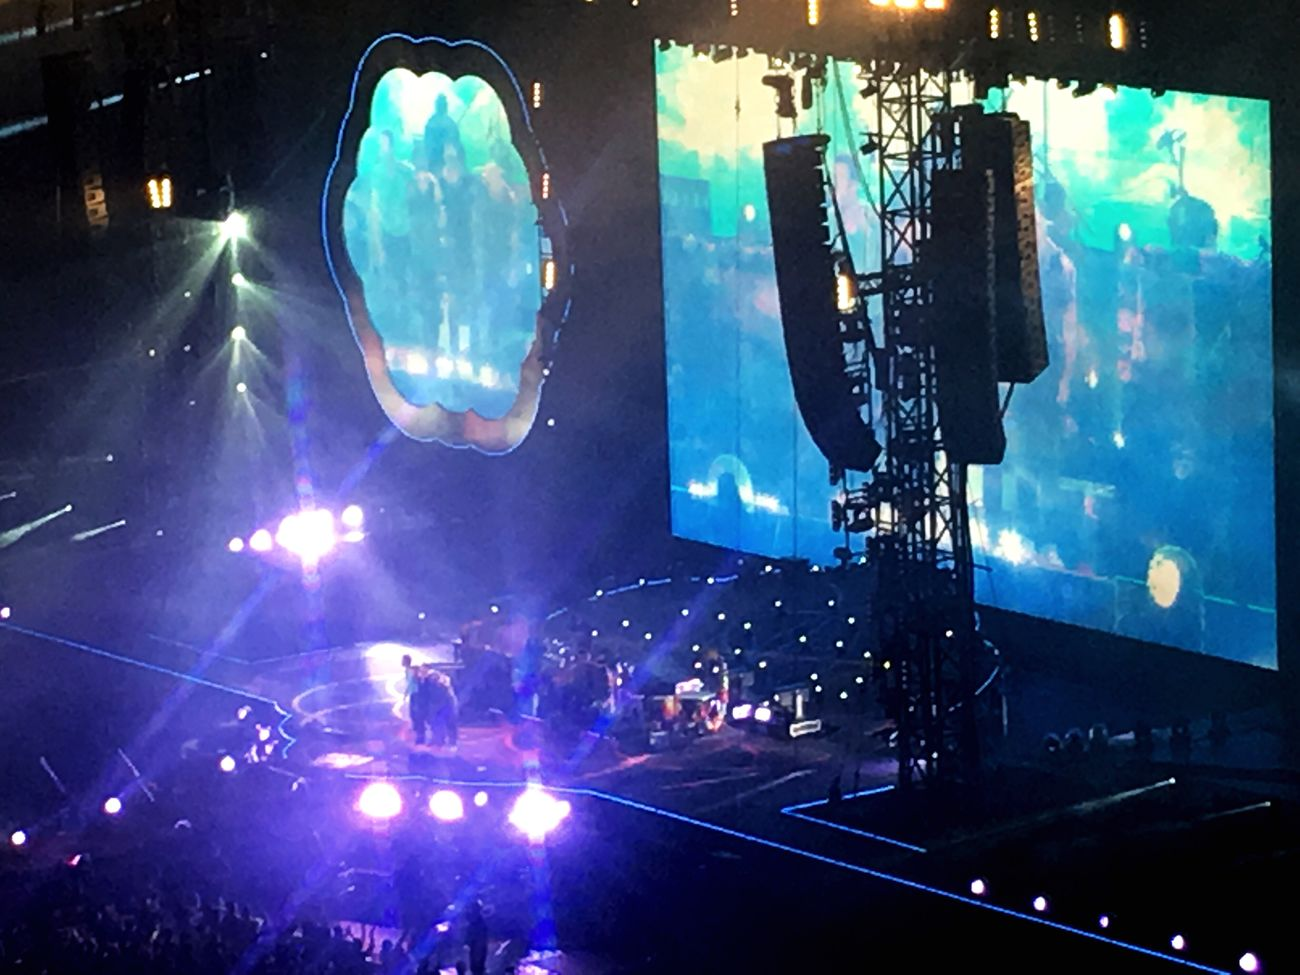 Coldplay AHFODtour Coldplay Concert  Chris Martin Guyberryman  Jonnybuckland Willchampion Tokyo Love Music Live Music Show Wonderful Thank You!